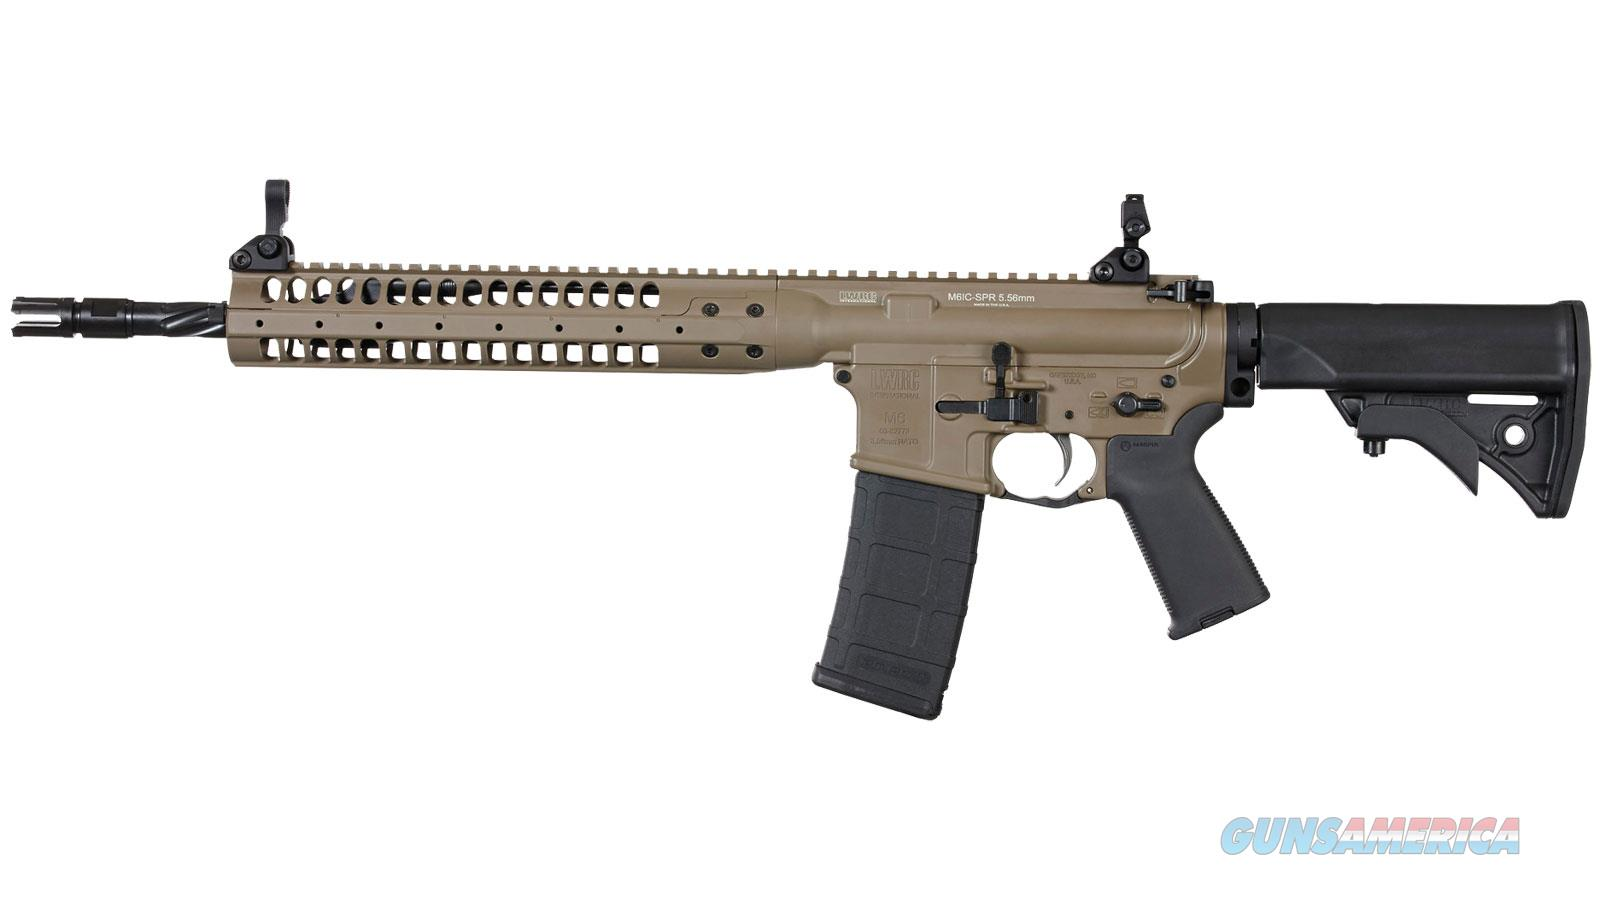 "Lwrc Icr5ck16spr Individual Carbine Spr Semi-Automatic 223 Remington/5.56 Nato 16.1"" 30+1 Adjustable Black Stk Flat Dark Earth Cerakote ICR5CK16SPR  Guns > Rifles > L Misc Rifles"